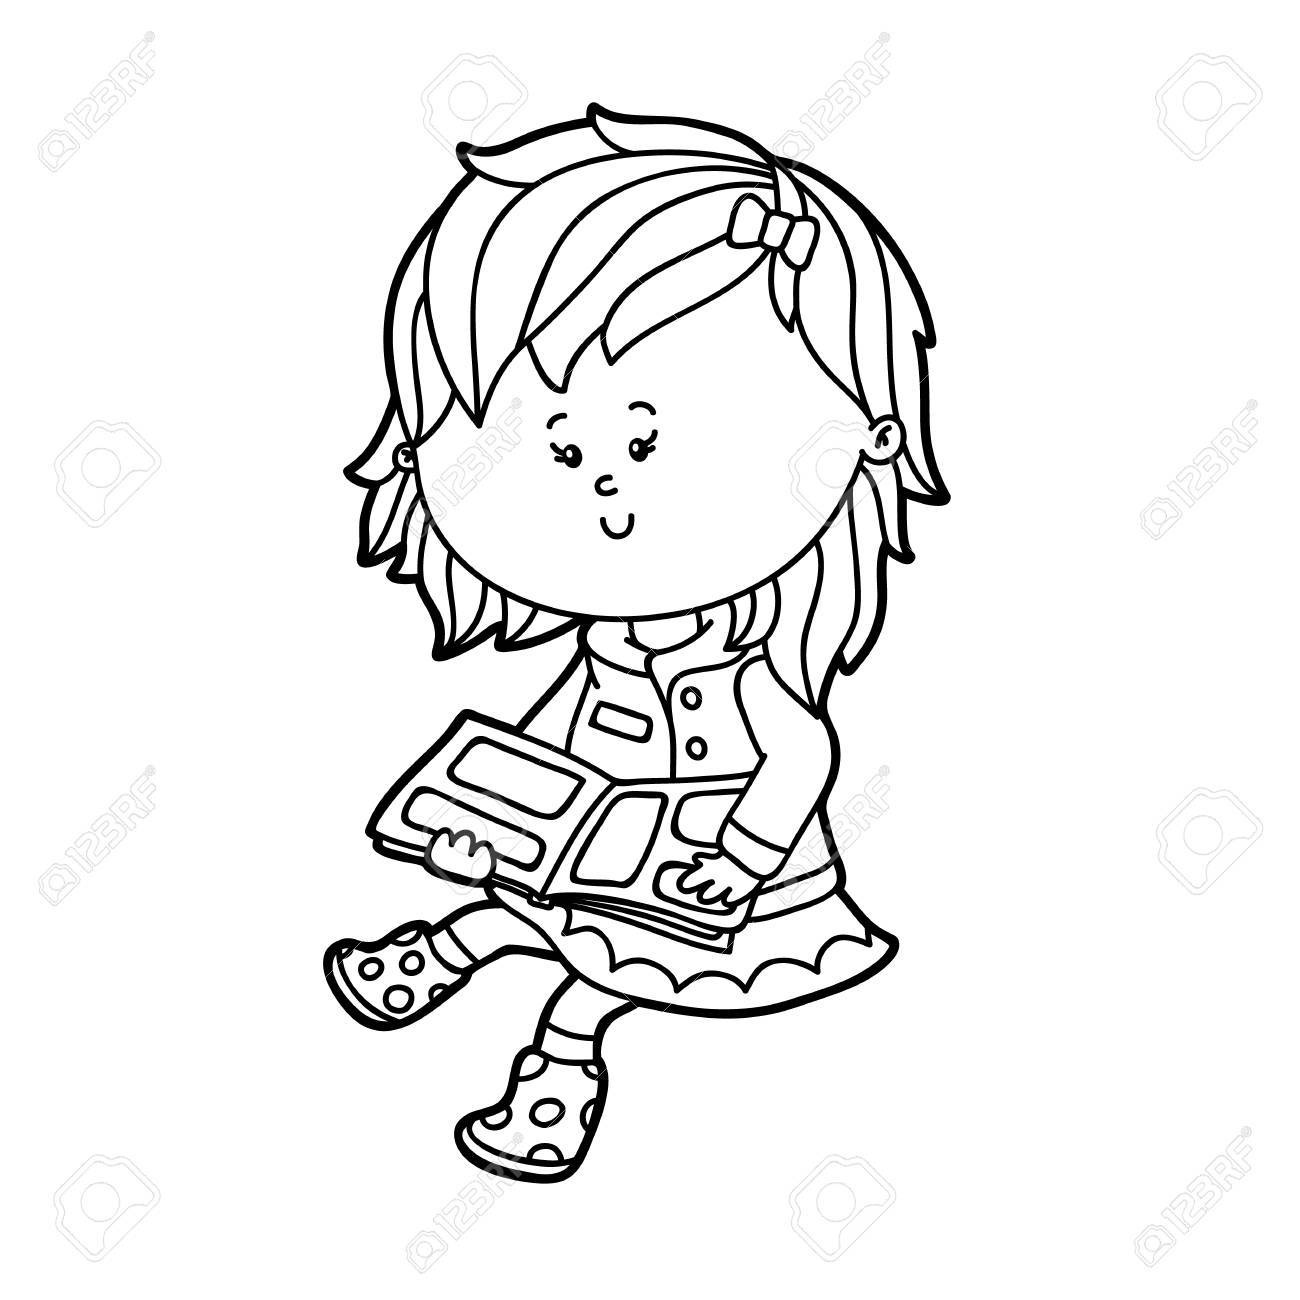 1300x1300 Vector Illustration Of Cute Cartoon Girl Character For Children